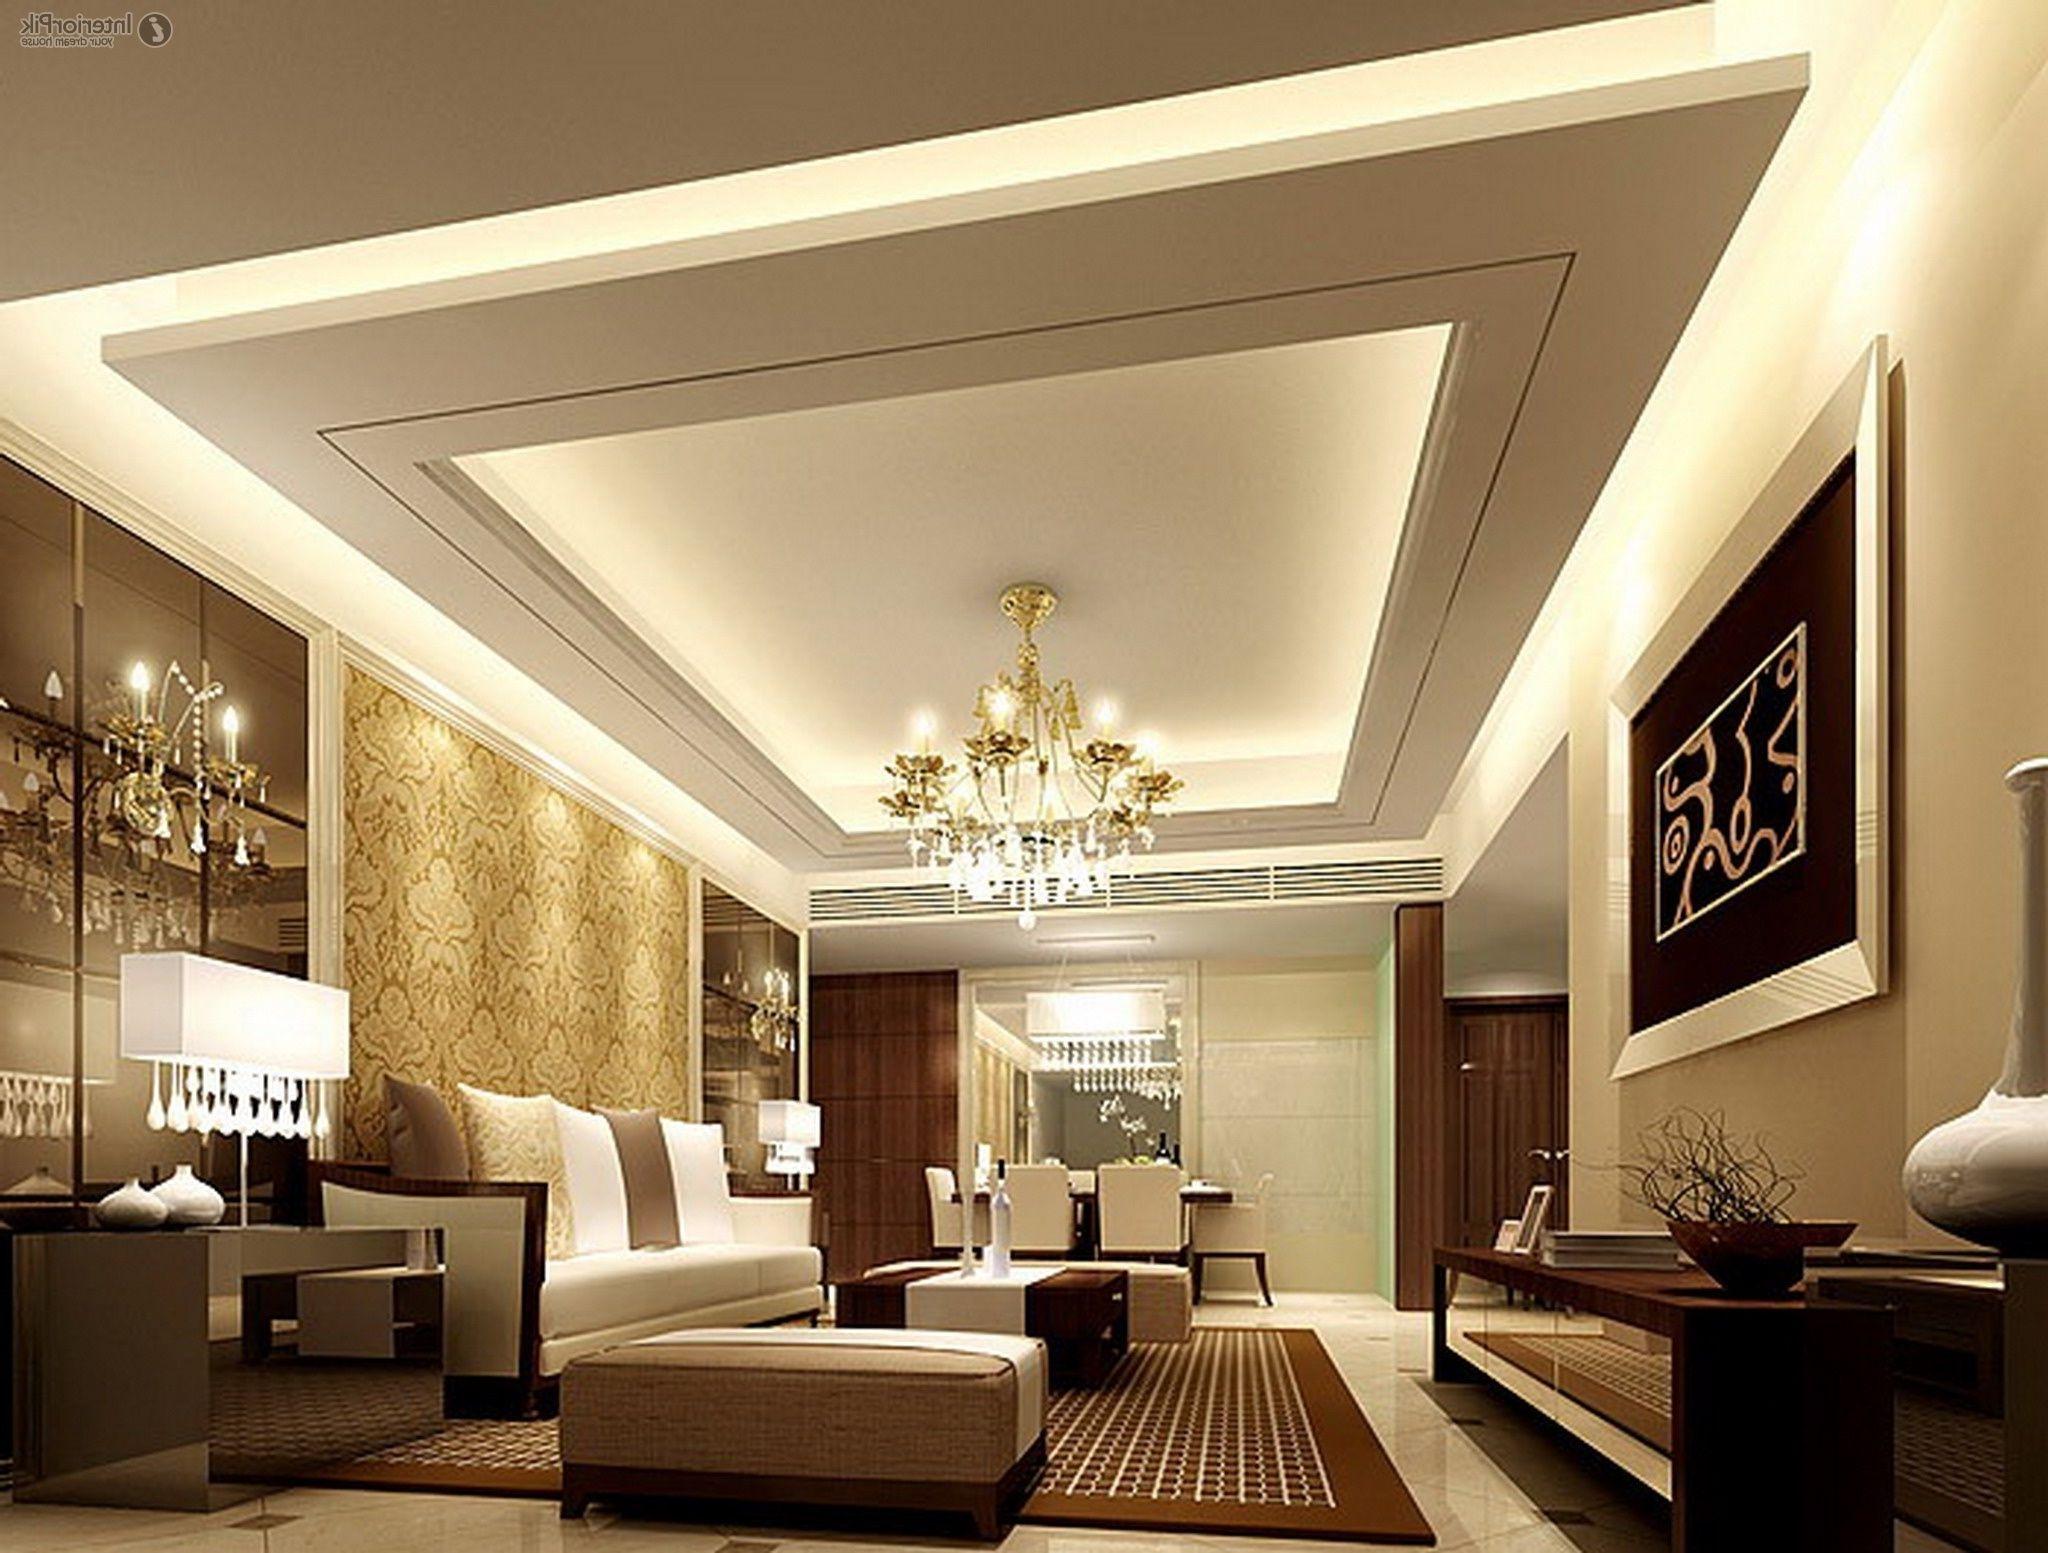 Gypsum ceiling design for living room lighting home decorate best also rh cz pinterest